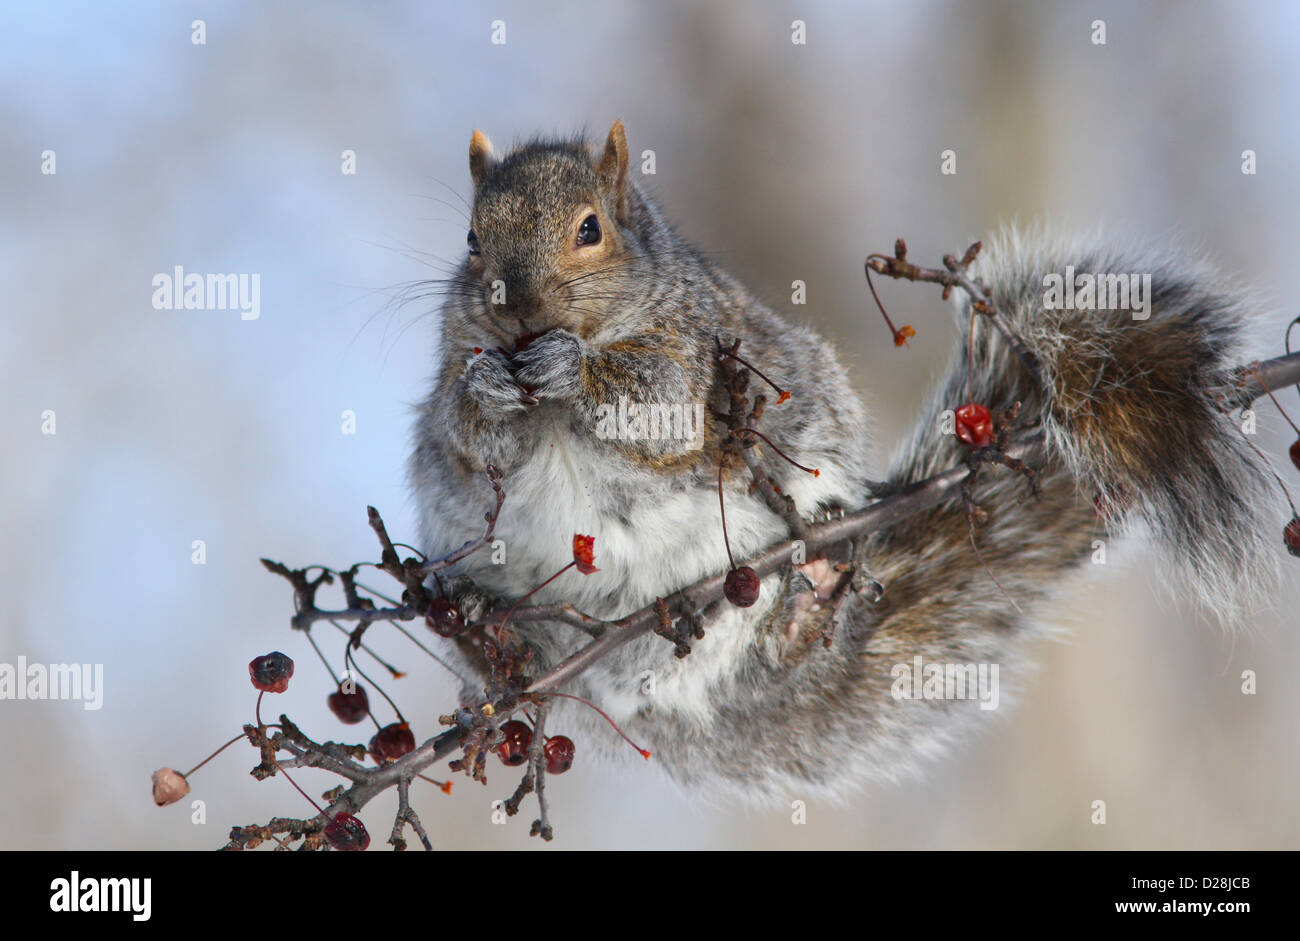 Grey squirrel (Sciurus carolinensis) eating fruits in winter - Stock Image